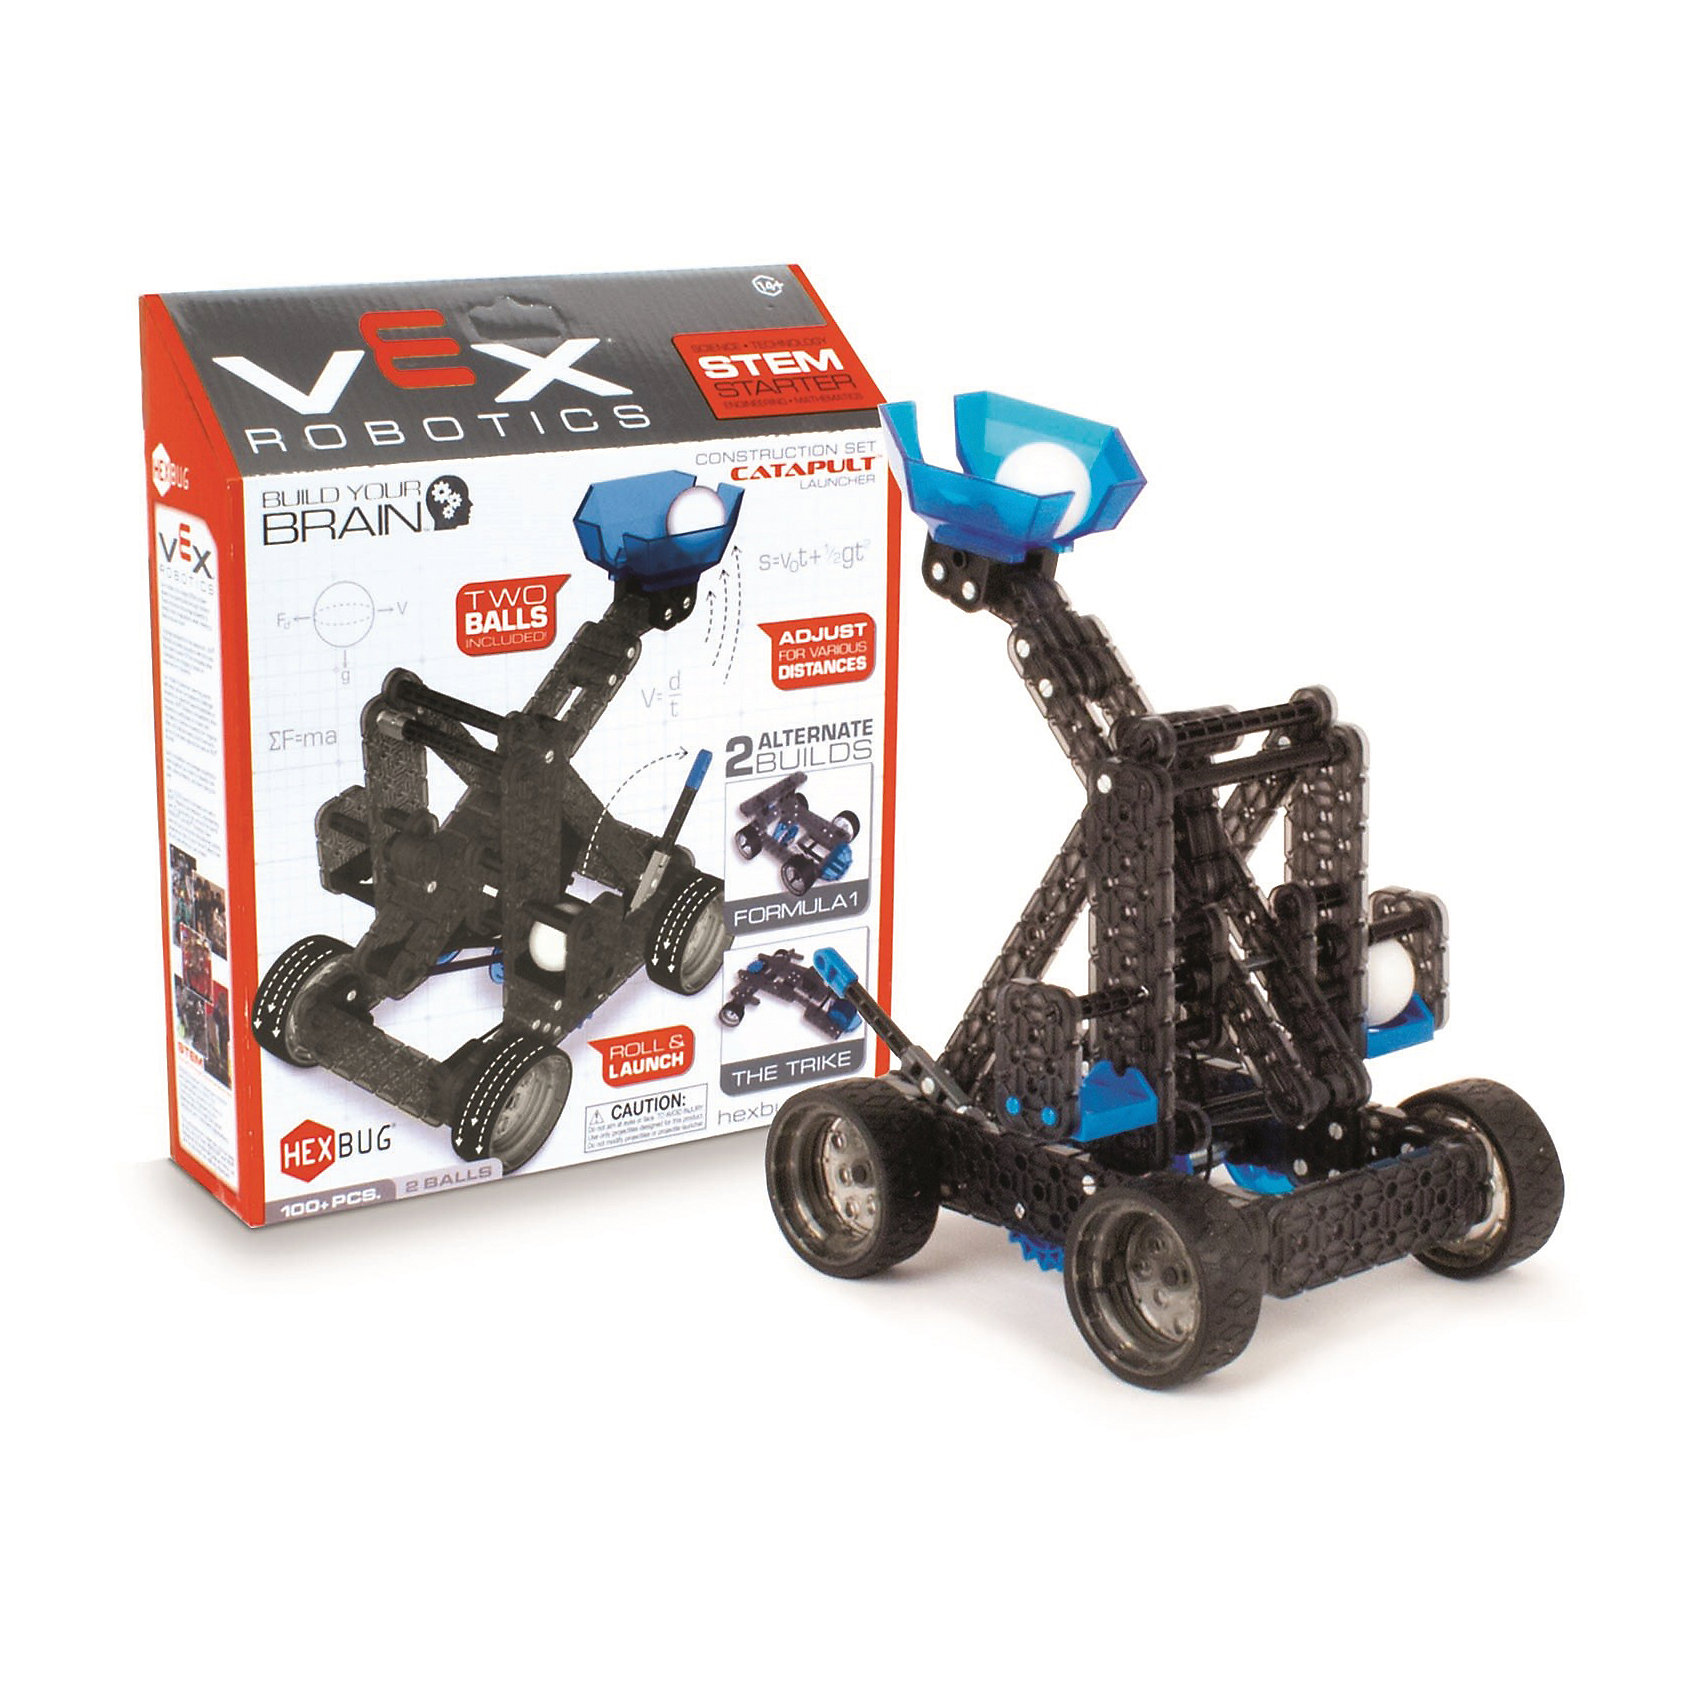 Конструктор VEX Catapult Launcher, 100 деталей, Hexbug<br><br>Ширина мм: 270<br>Глубина мм: 60<br>Высота мм: 230<br>Вес г: 426<br>Возраст от месяцев: 36<br>Возраст до месяцев: 2147483647<br>Пол: Унисекс<br>Возраст: Детский<br>SKU: 5507204